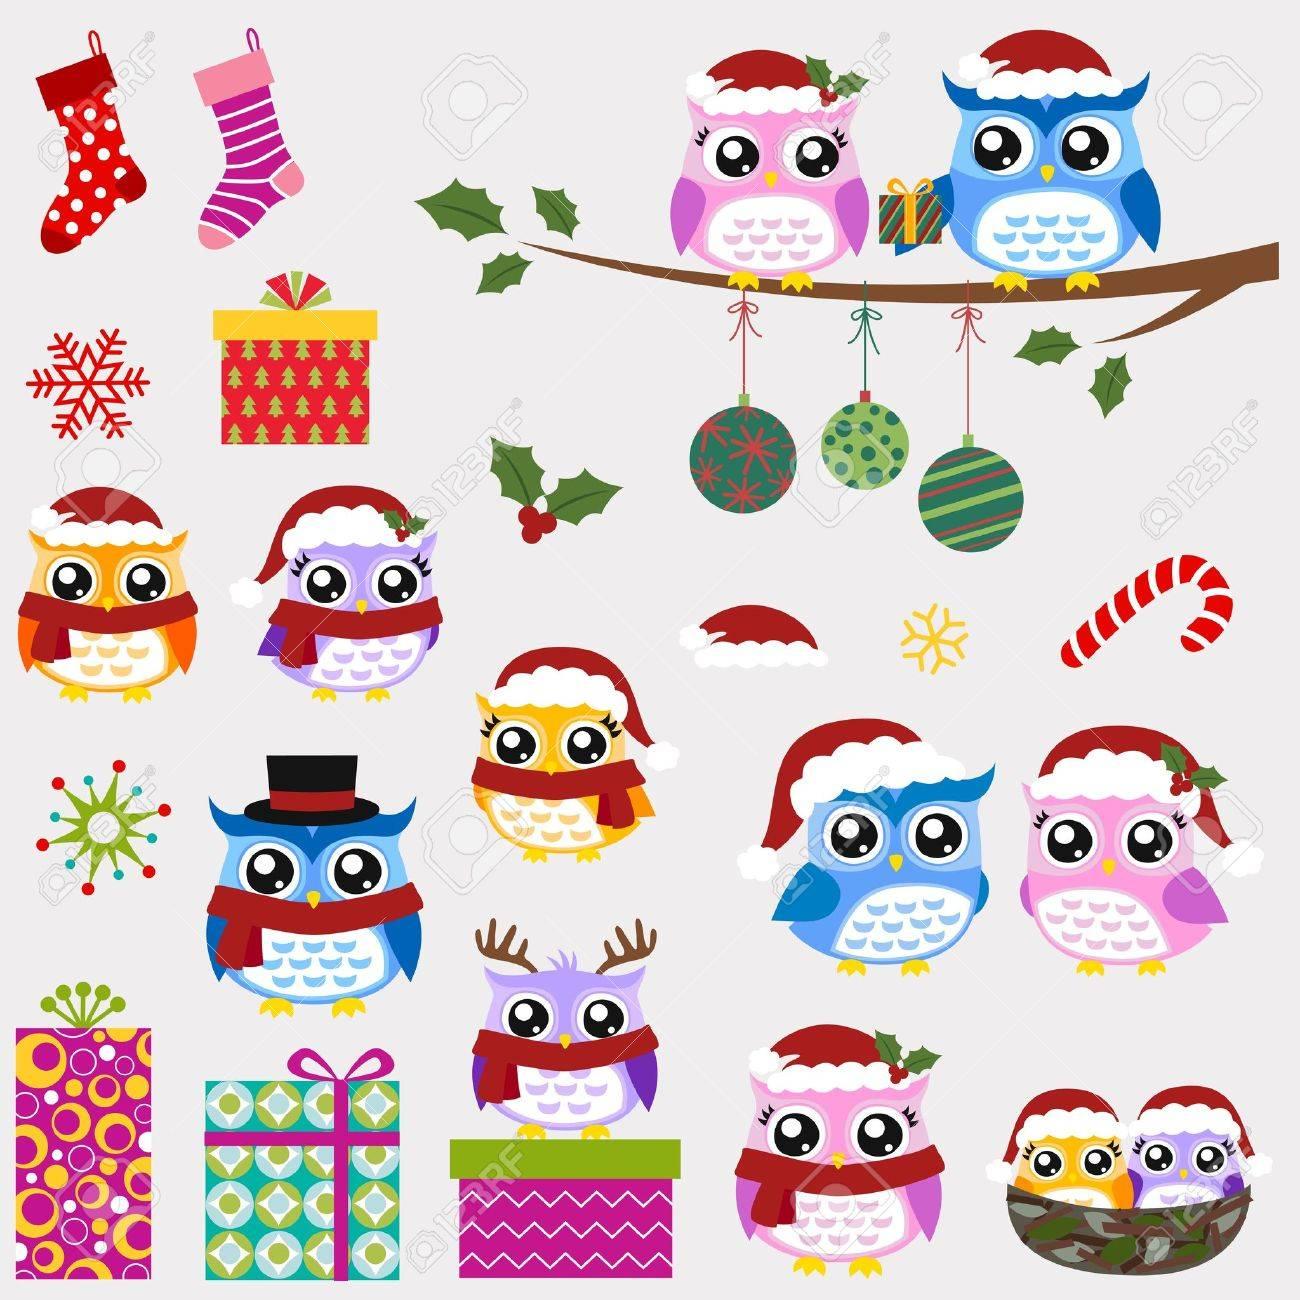 owl family christmas greeting Stock Vector - 16477735